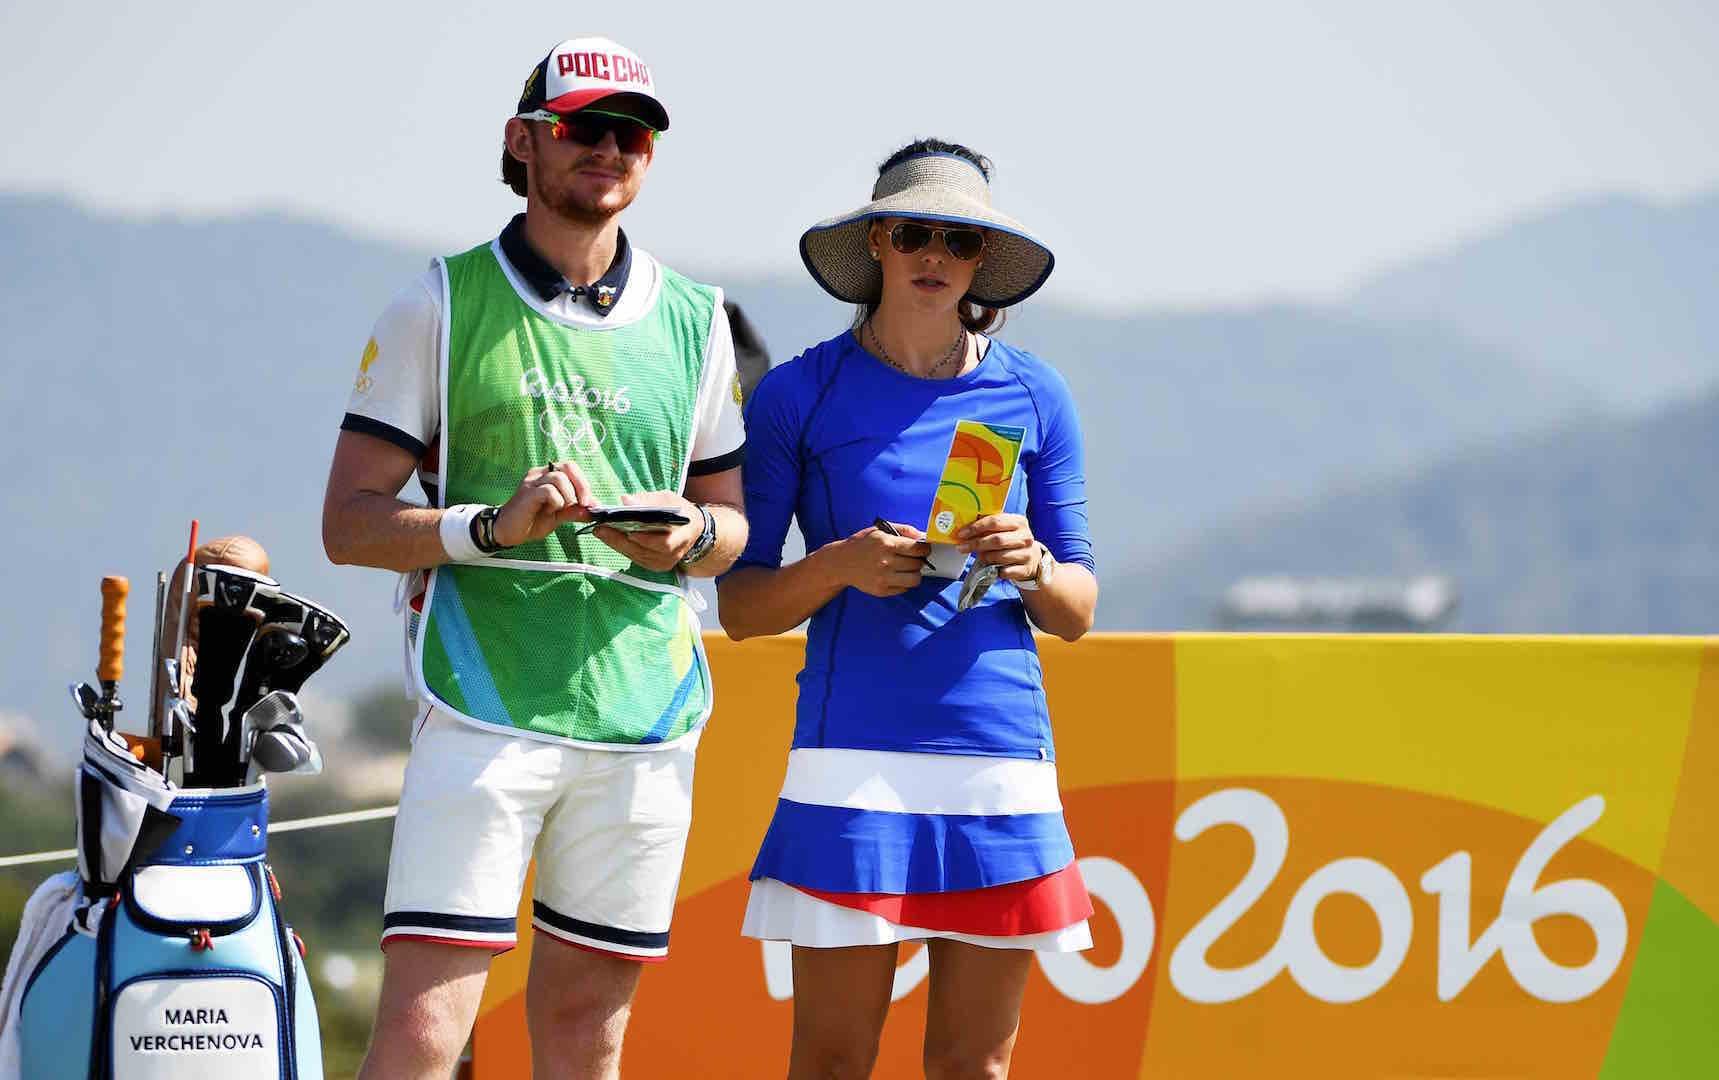 UK student on Maria Verchenova's Olympic bag